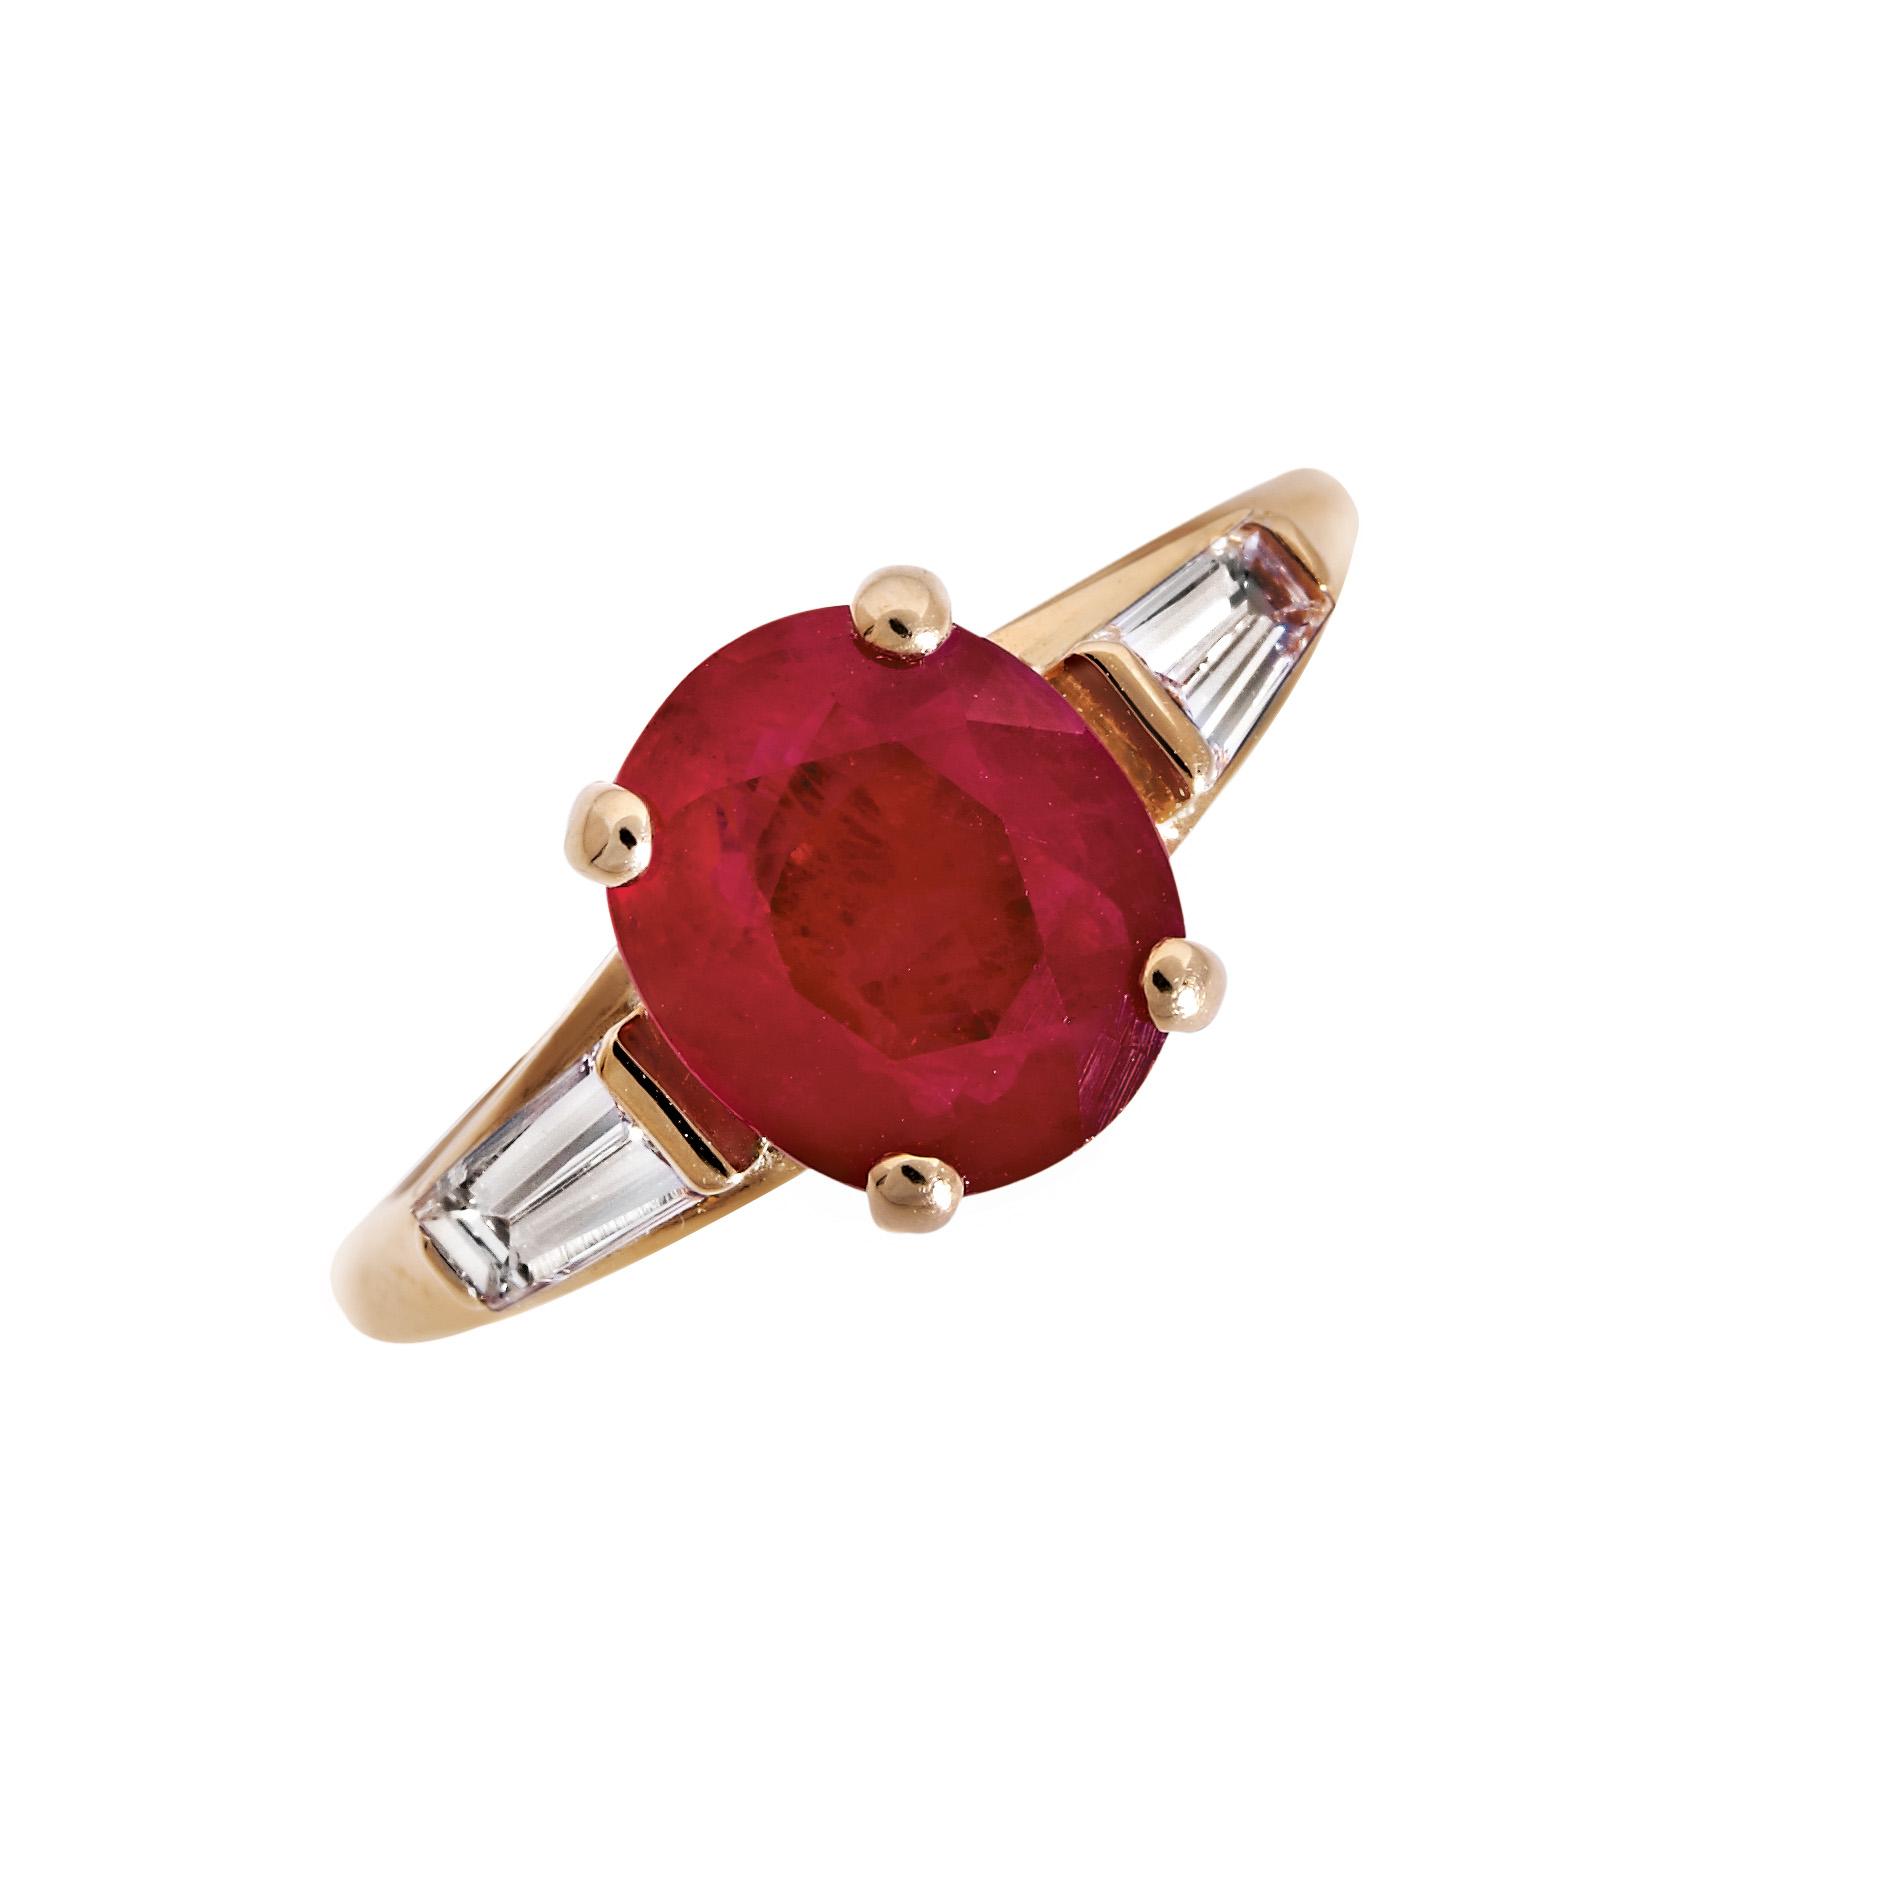 Bague Rubis et Diamants - Pascal IZERN